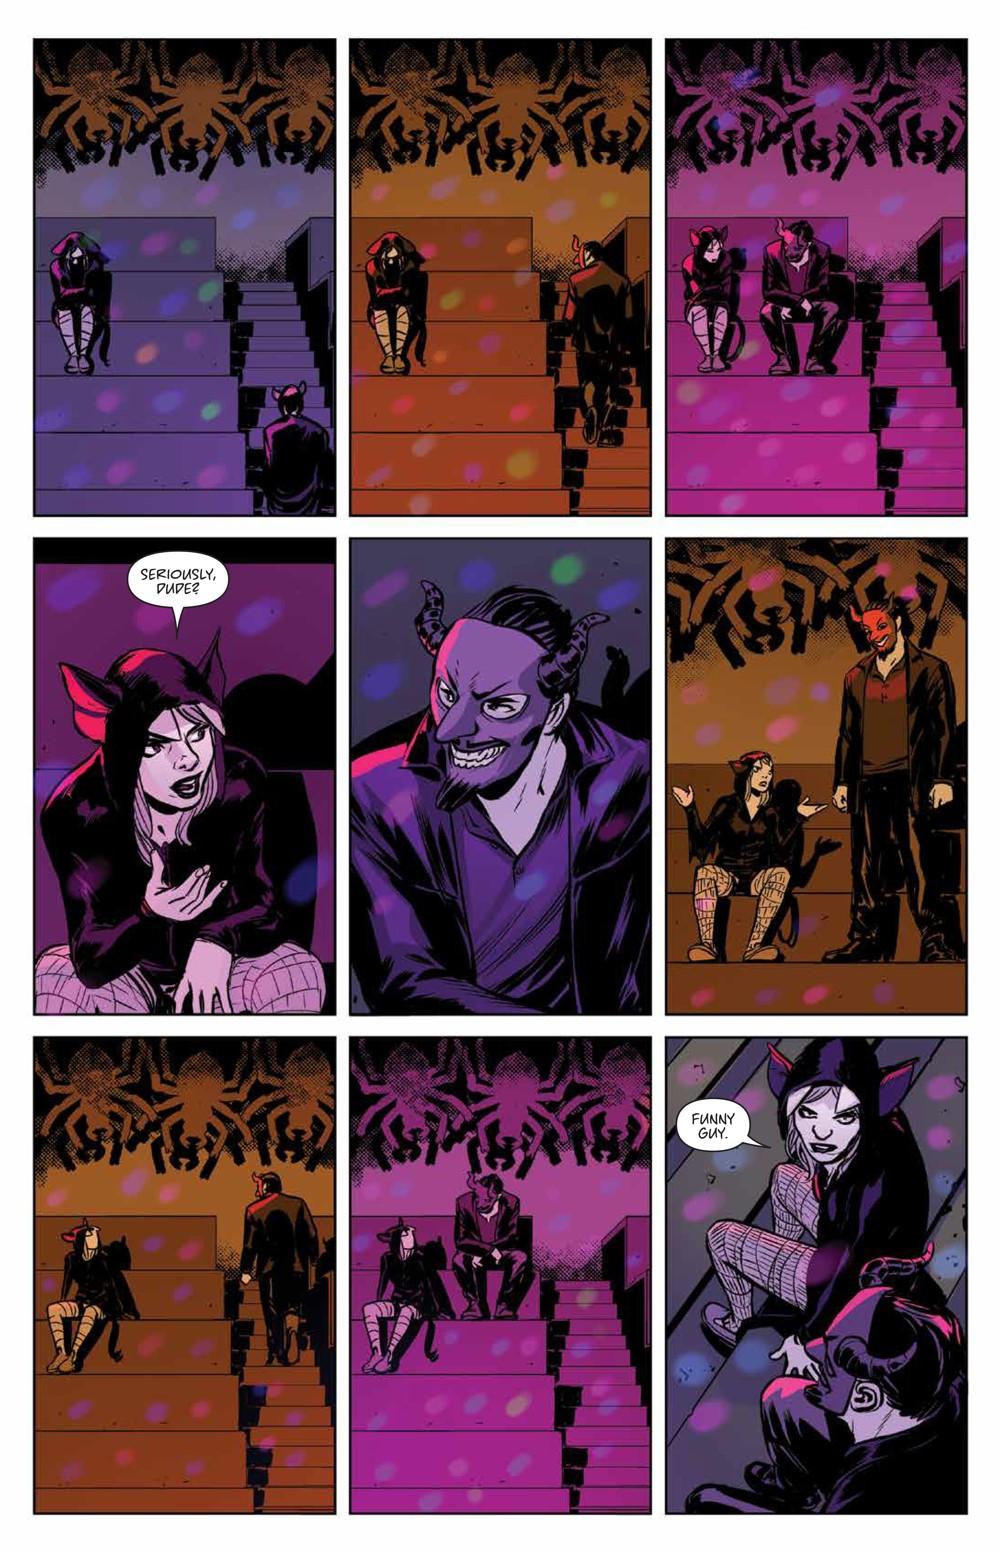 Buffy_Deluxe_v2_Hellmouth_HC_PRESS_17 ComicList Previews: BUFFY THE VAMPIRE SLAYER HELLMOUTH DELUXE EDITION HC